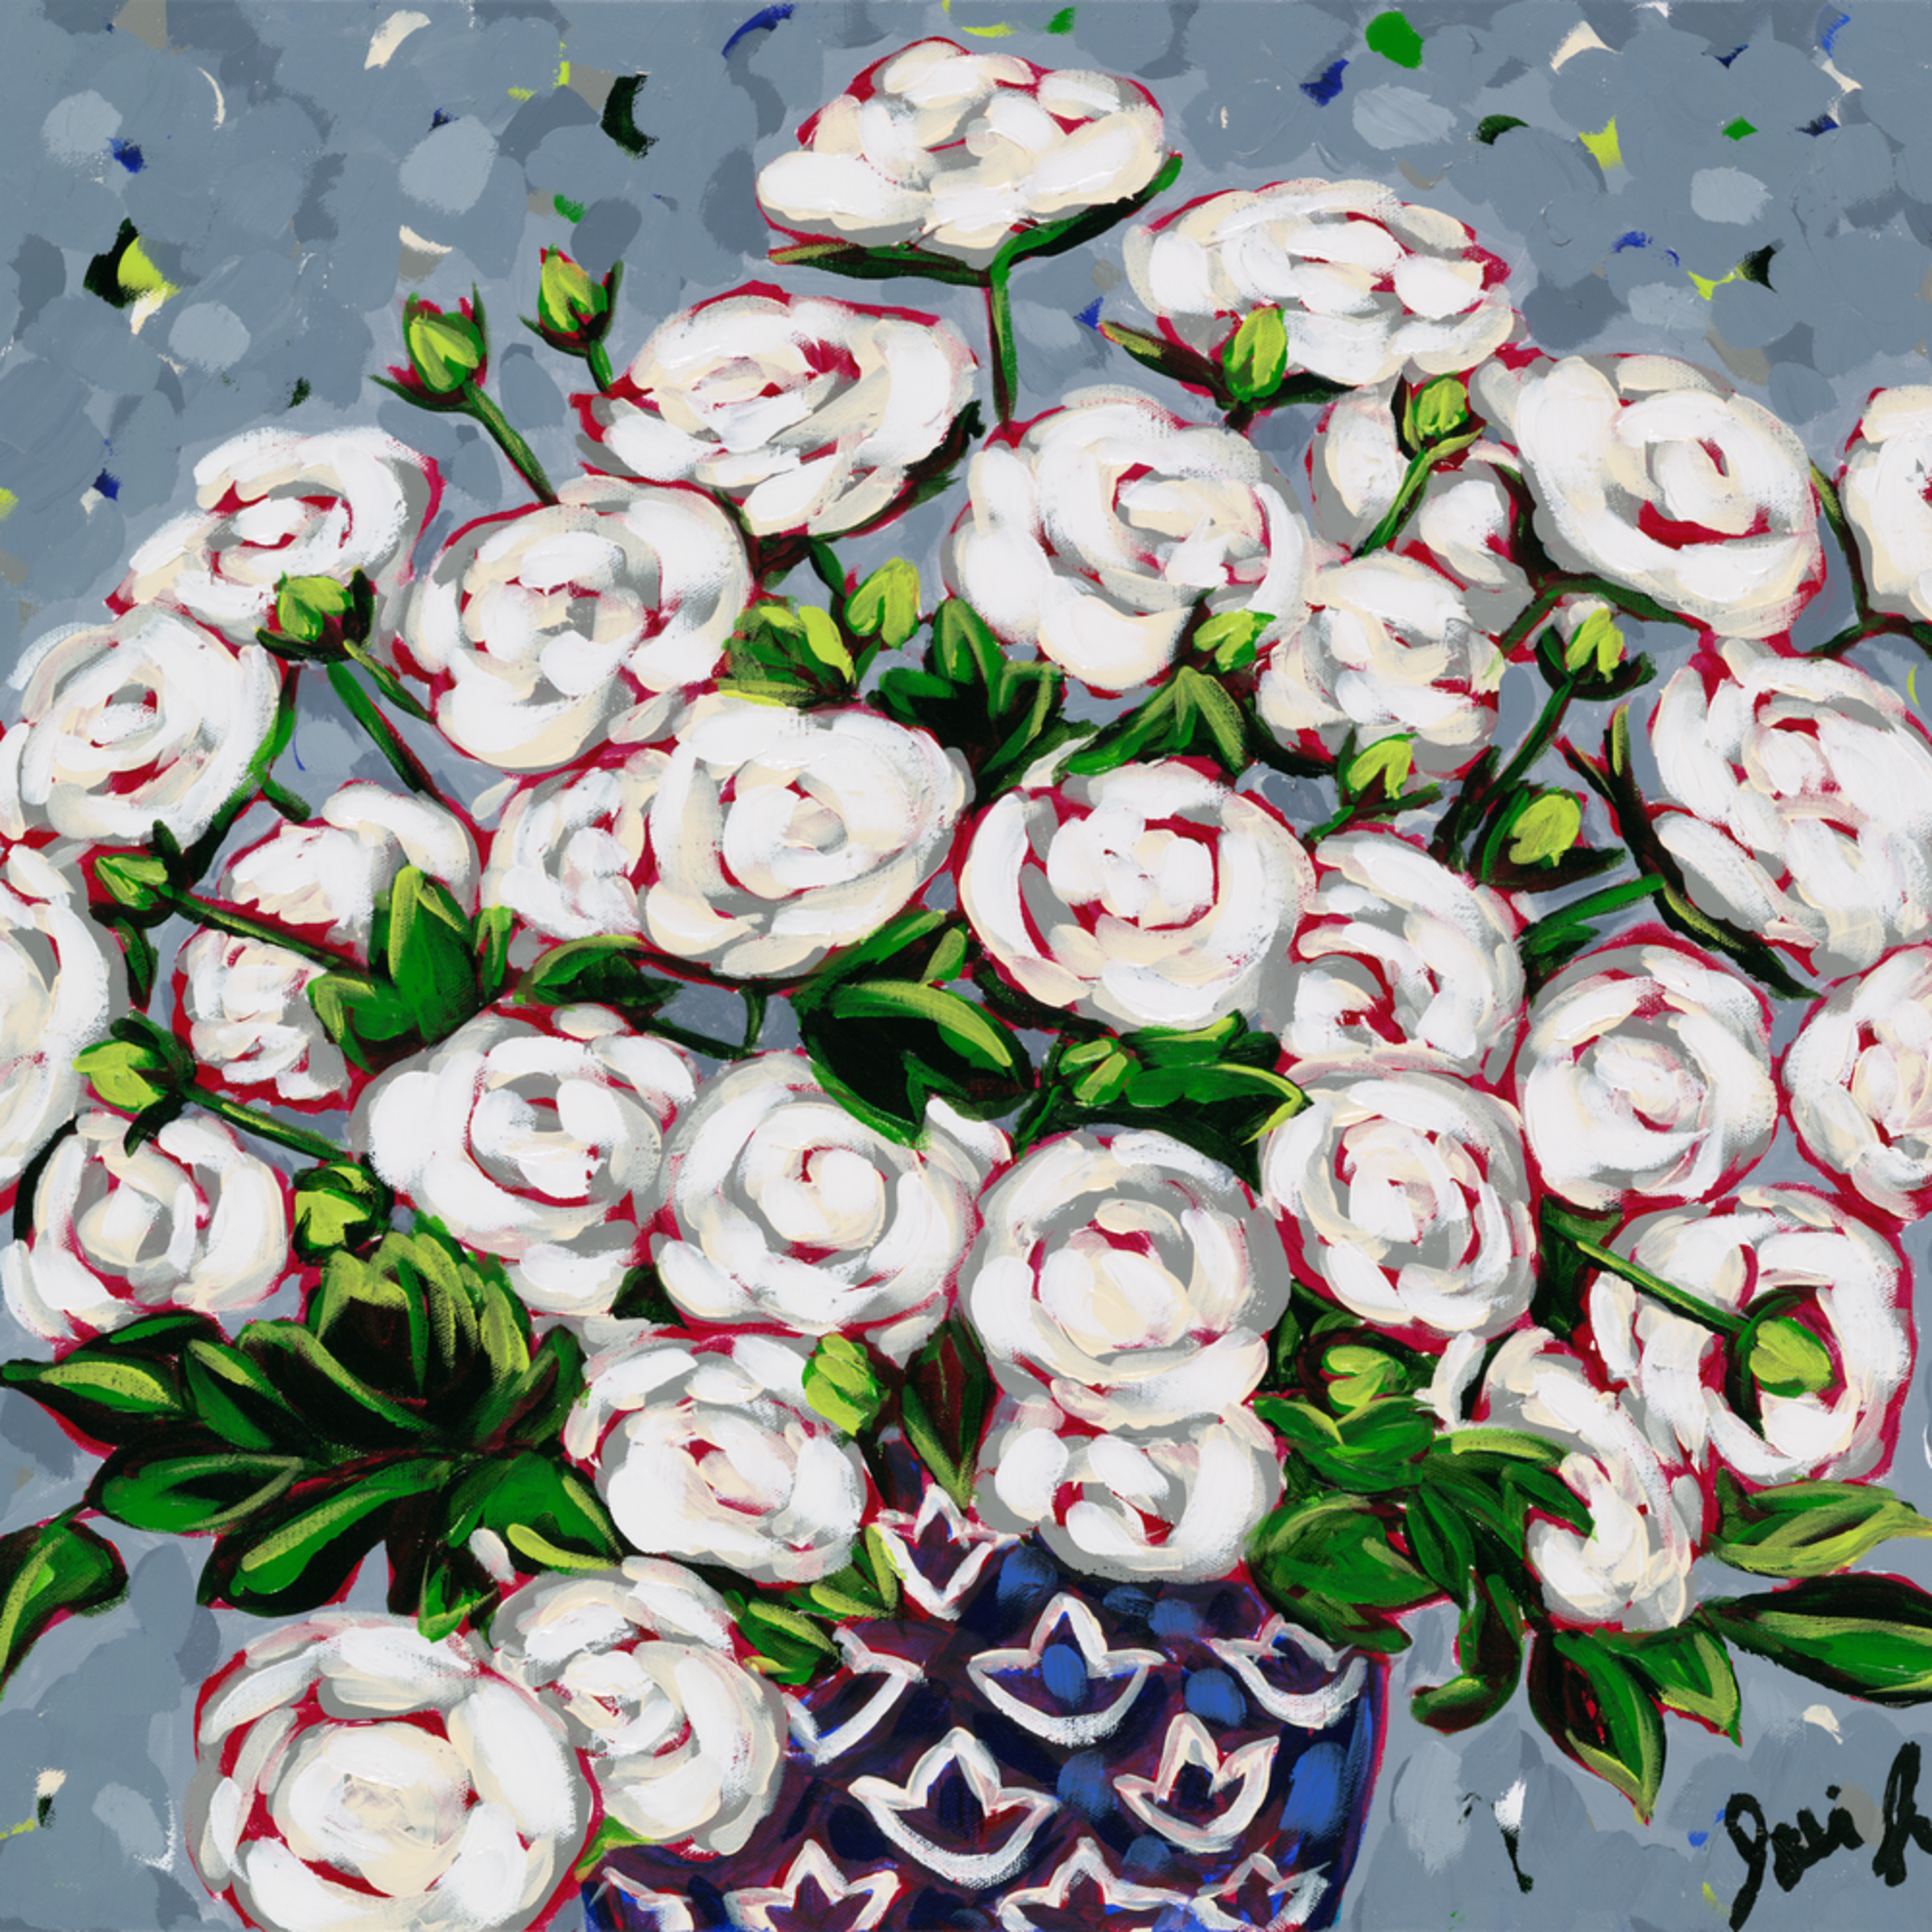 Jodi augustine white roses asf ksx0th